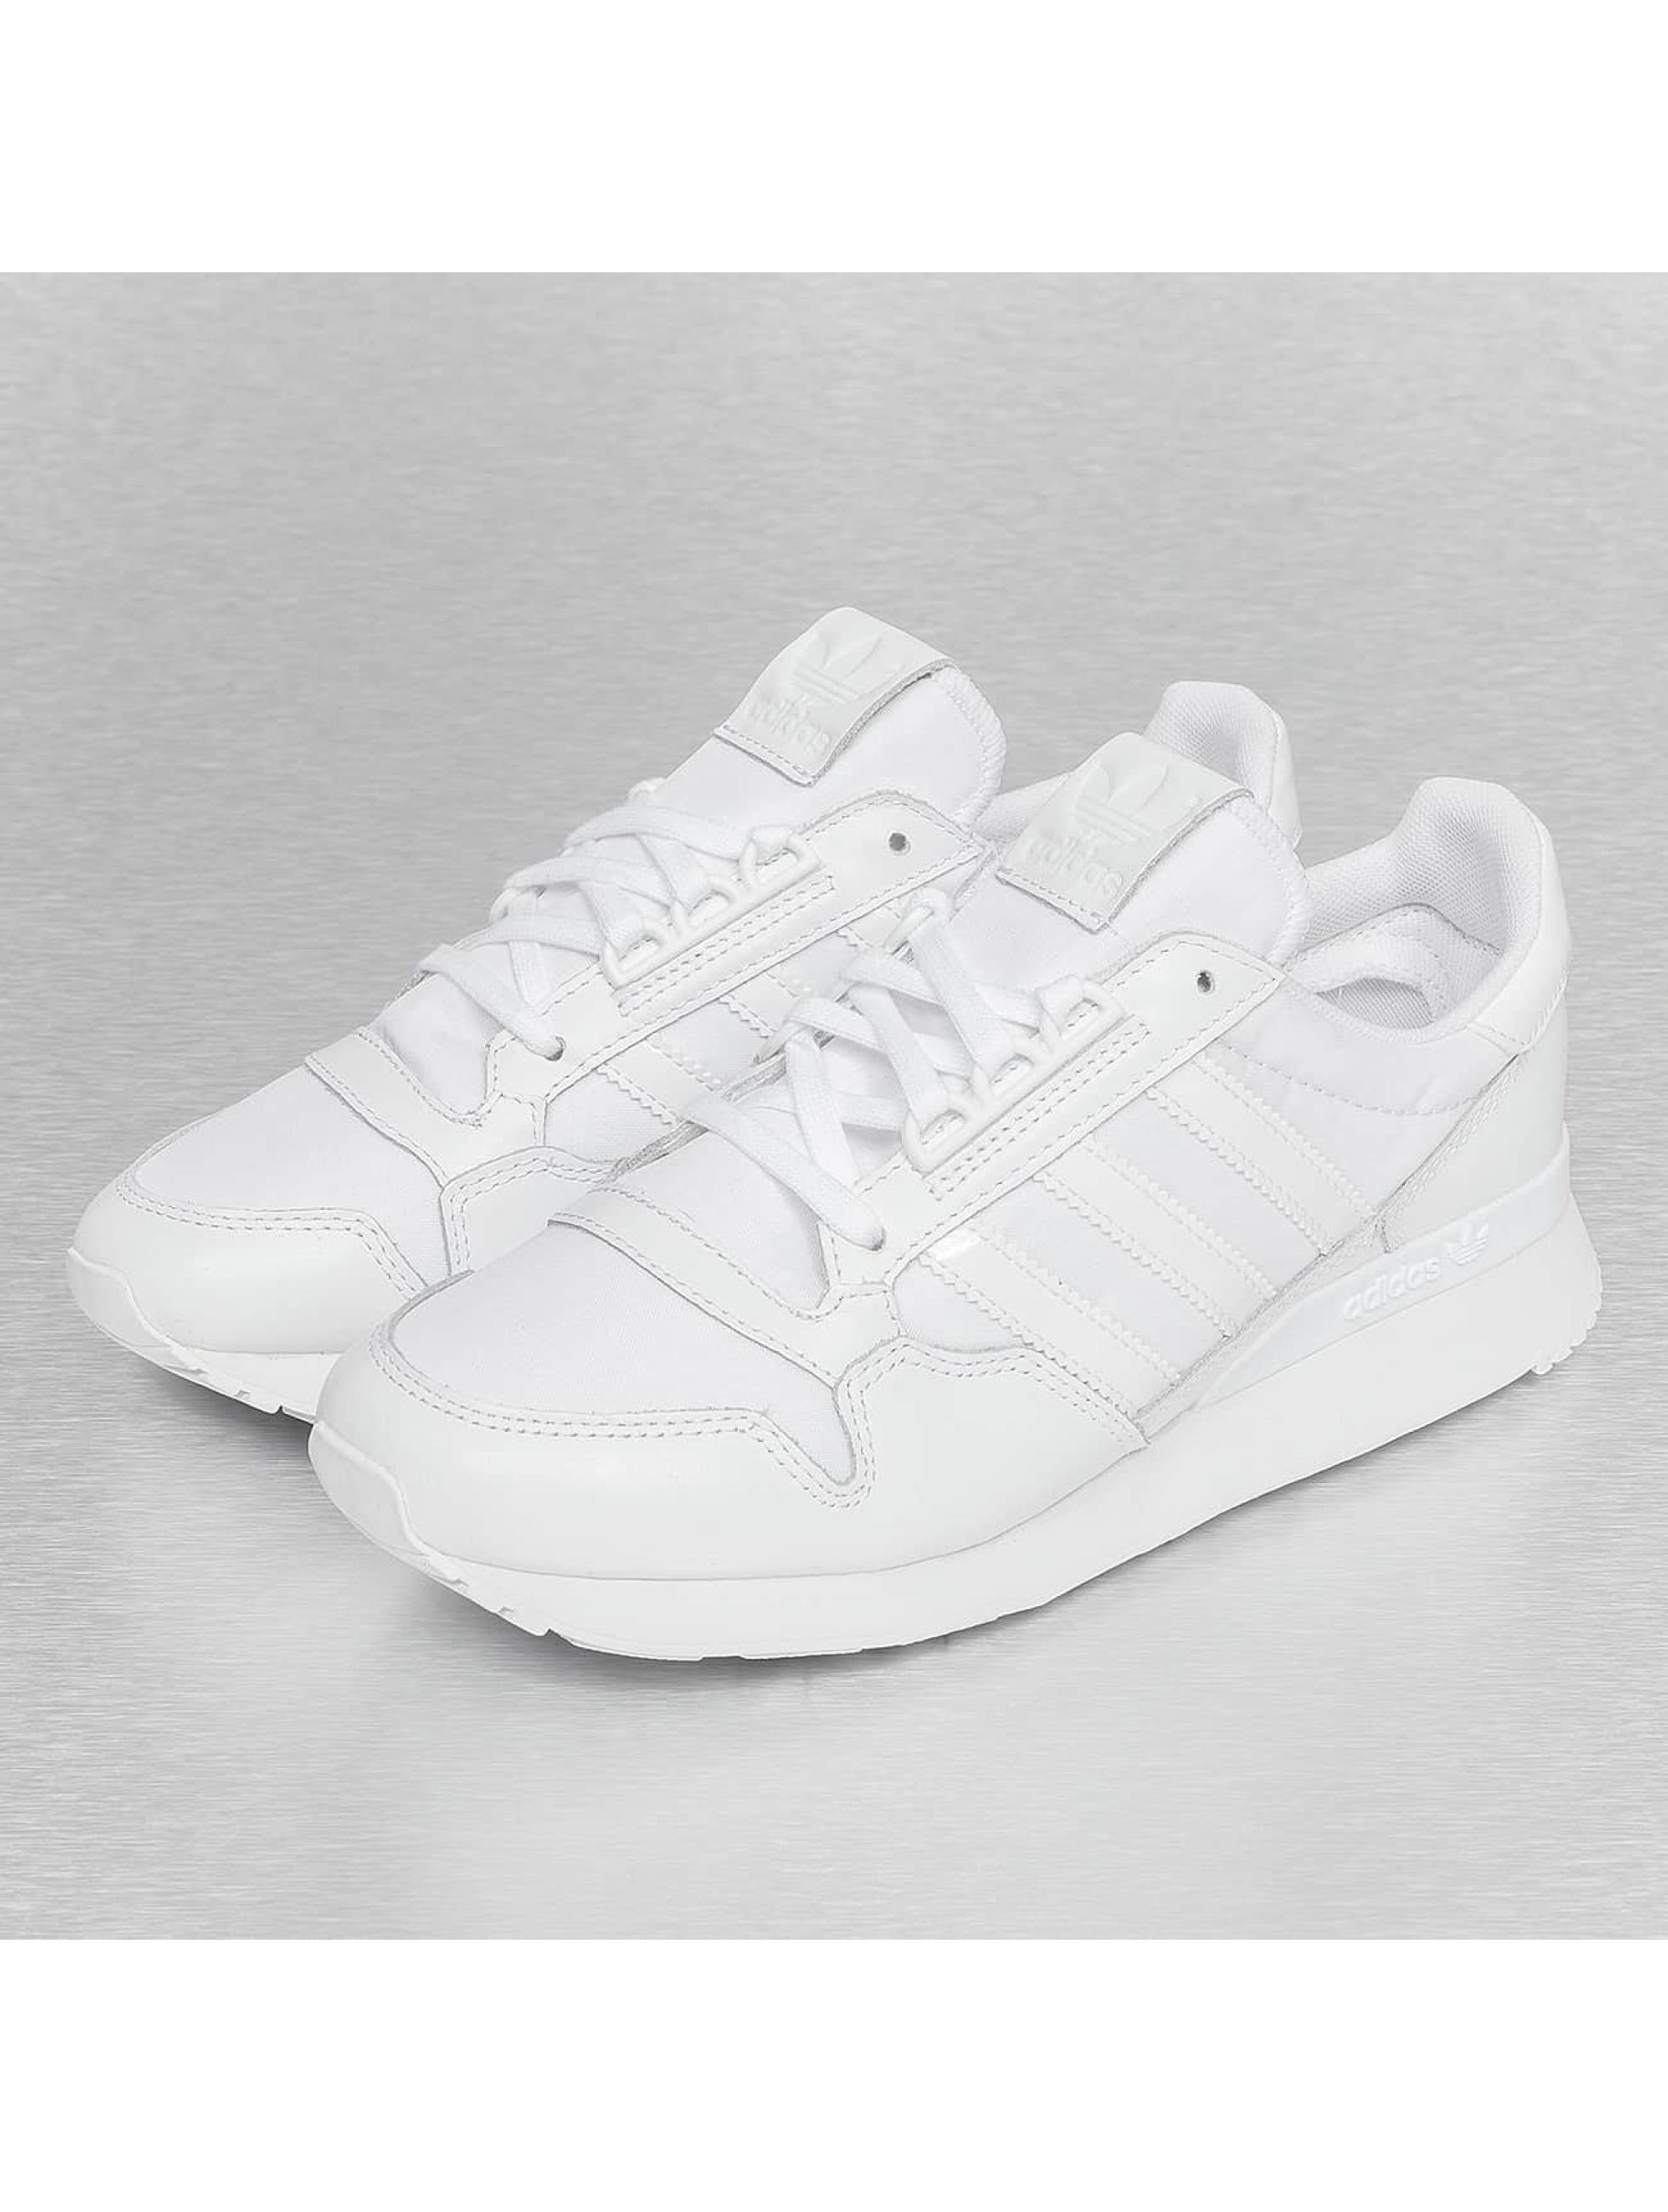 Adidas Schwarz Weiß Schuhe Damen o ton